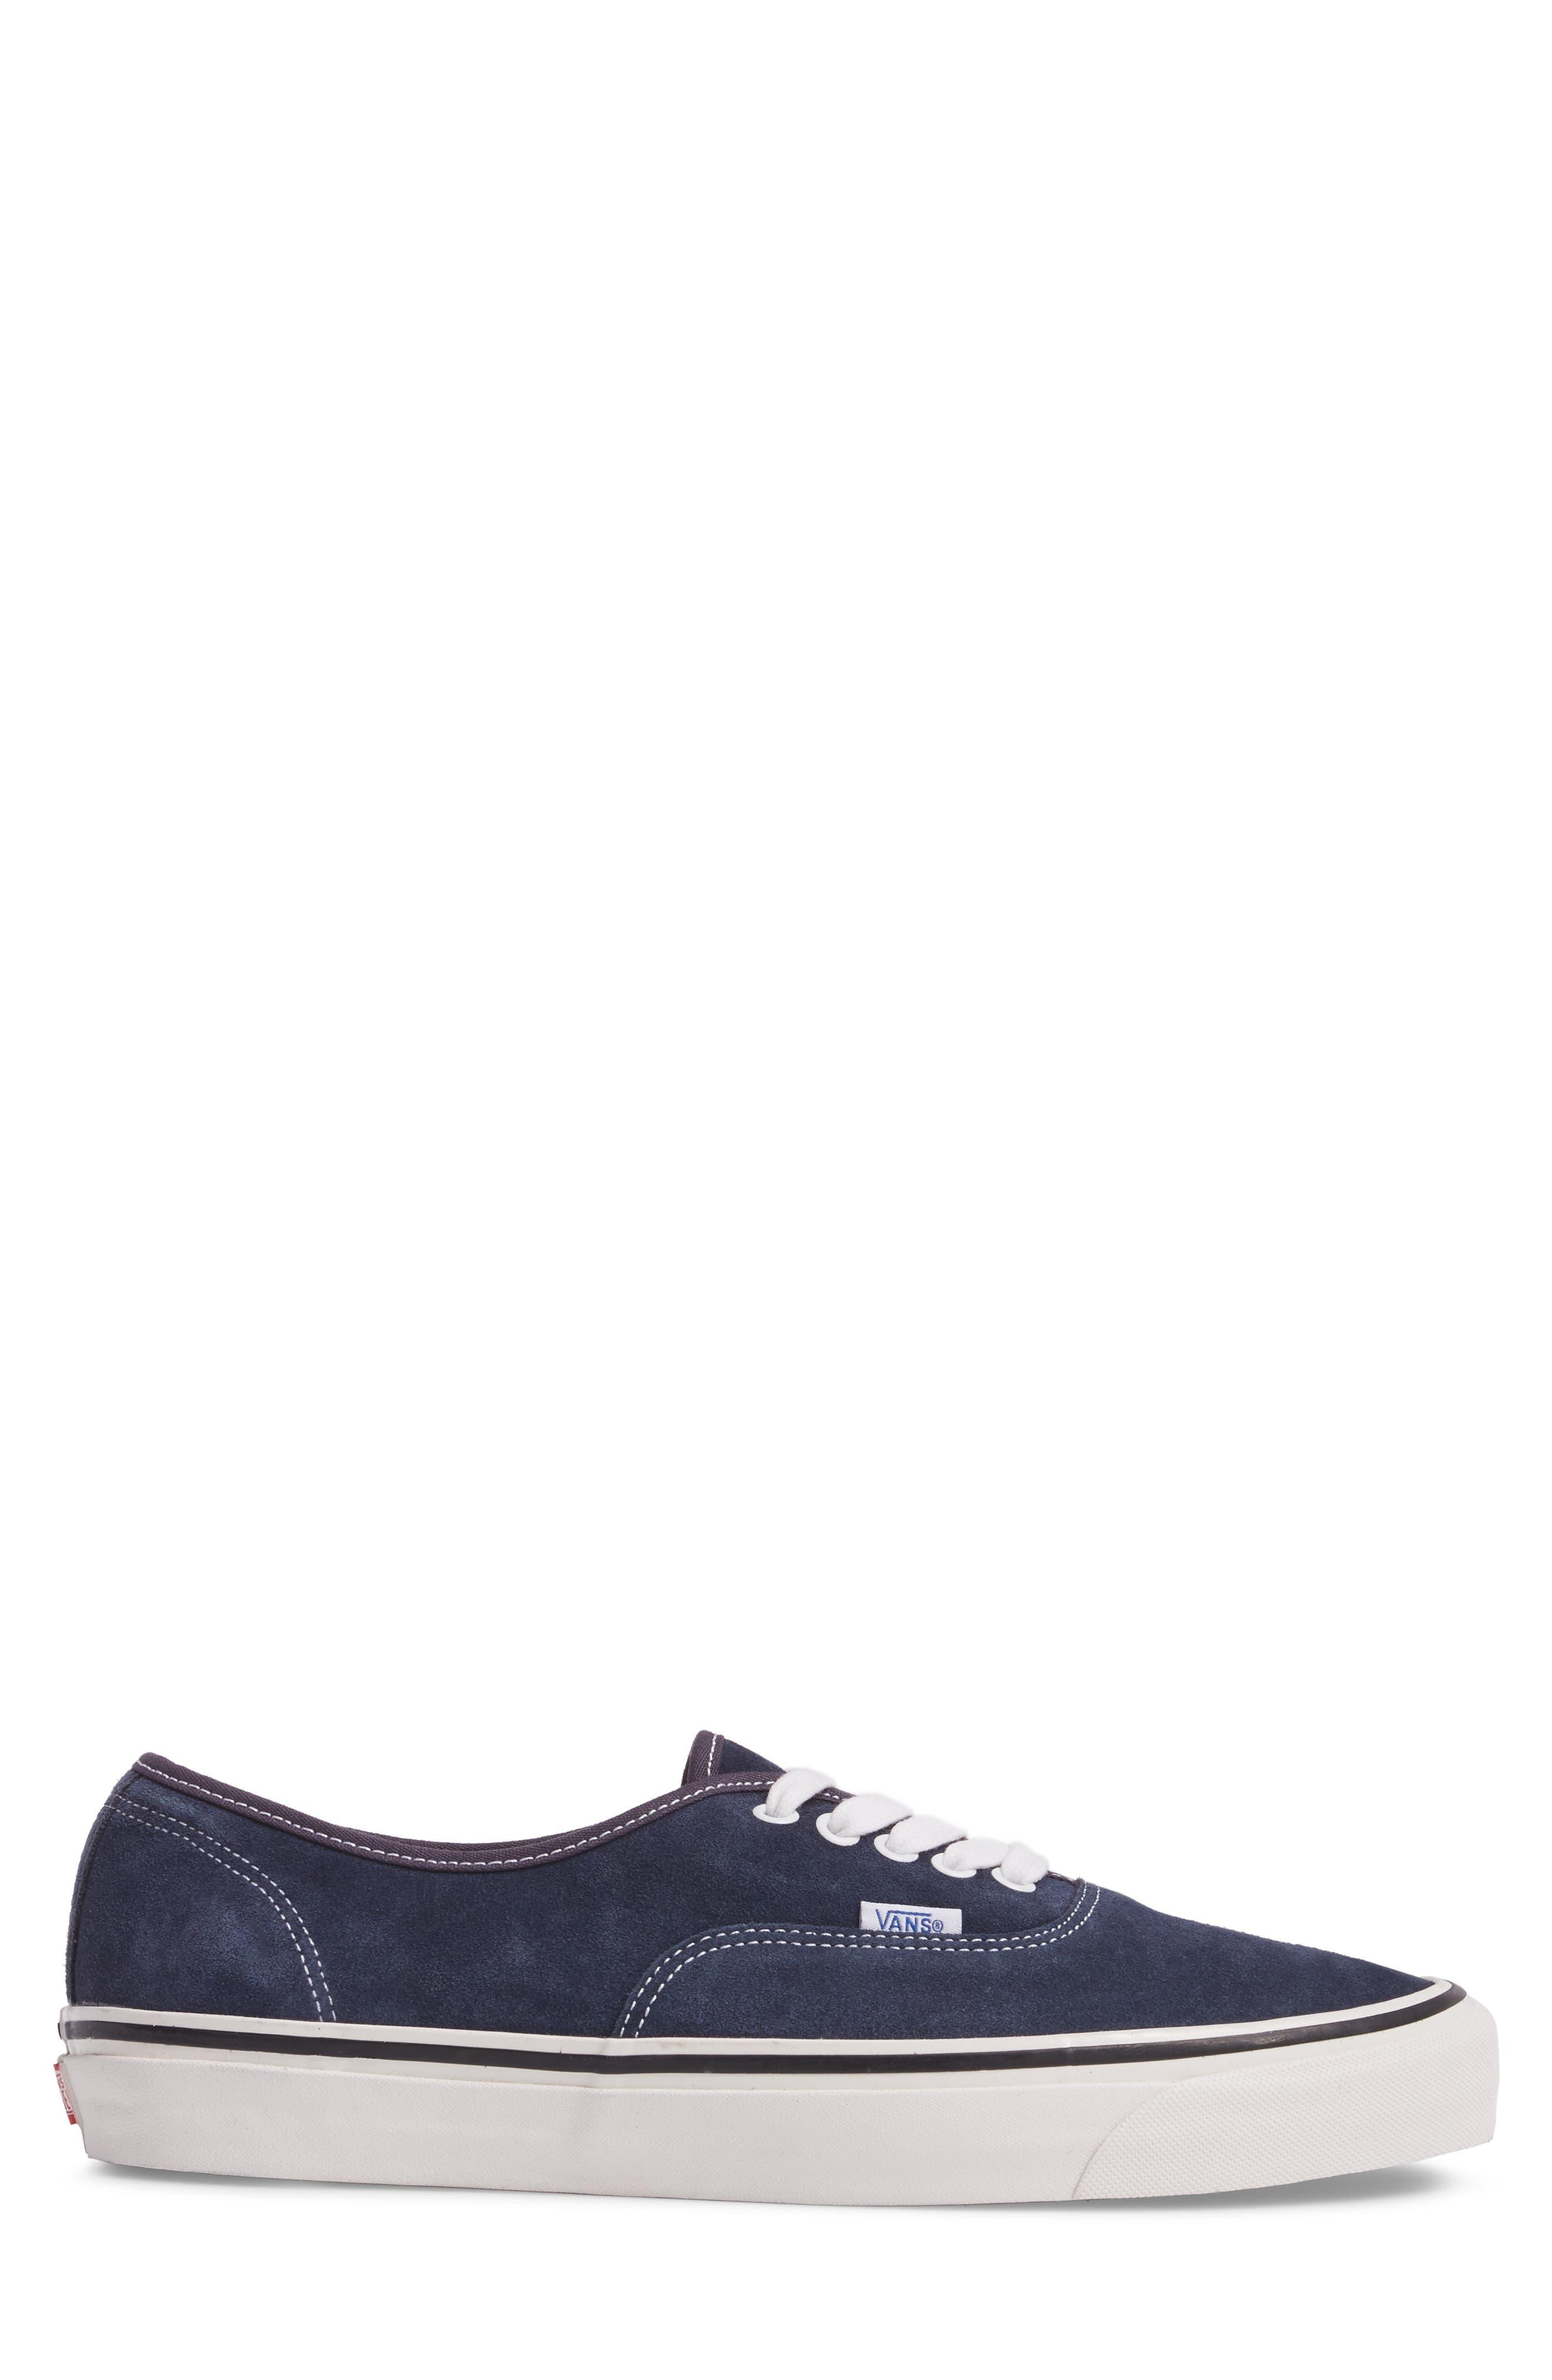 Alternate Image 3  - Vans UA Authentic 44 DX Sneaker (Men)